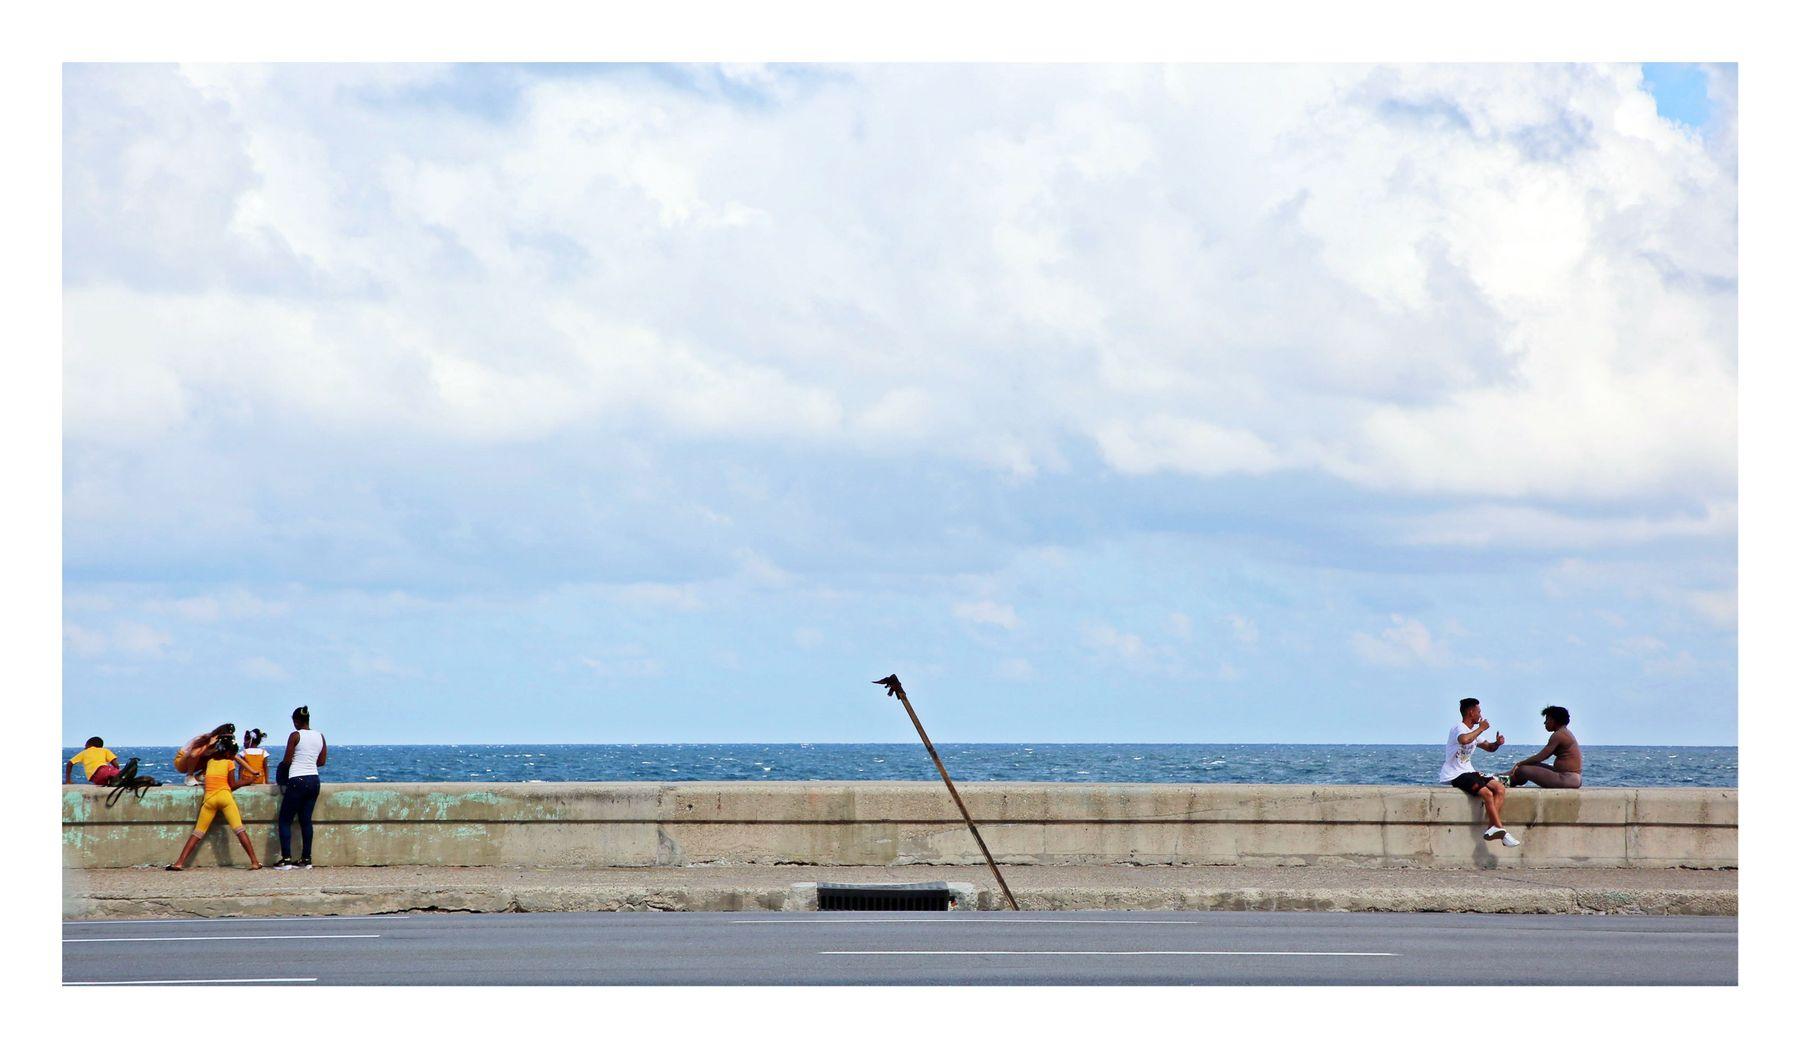 brisa del este cuba la habana vieja libre isla bonita malecón